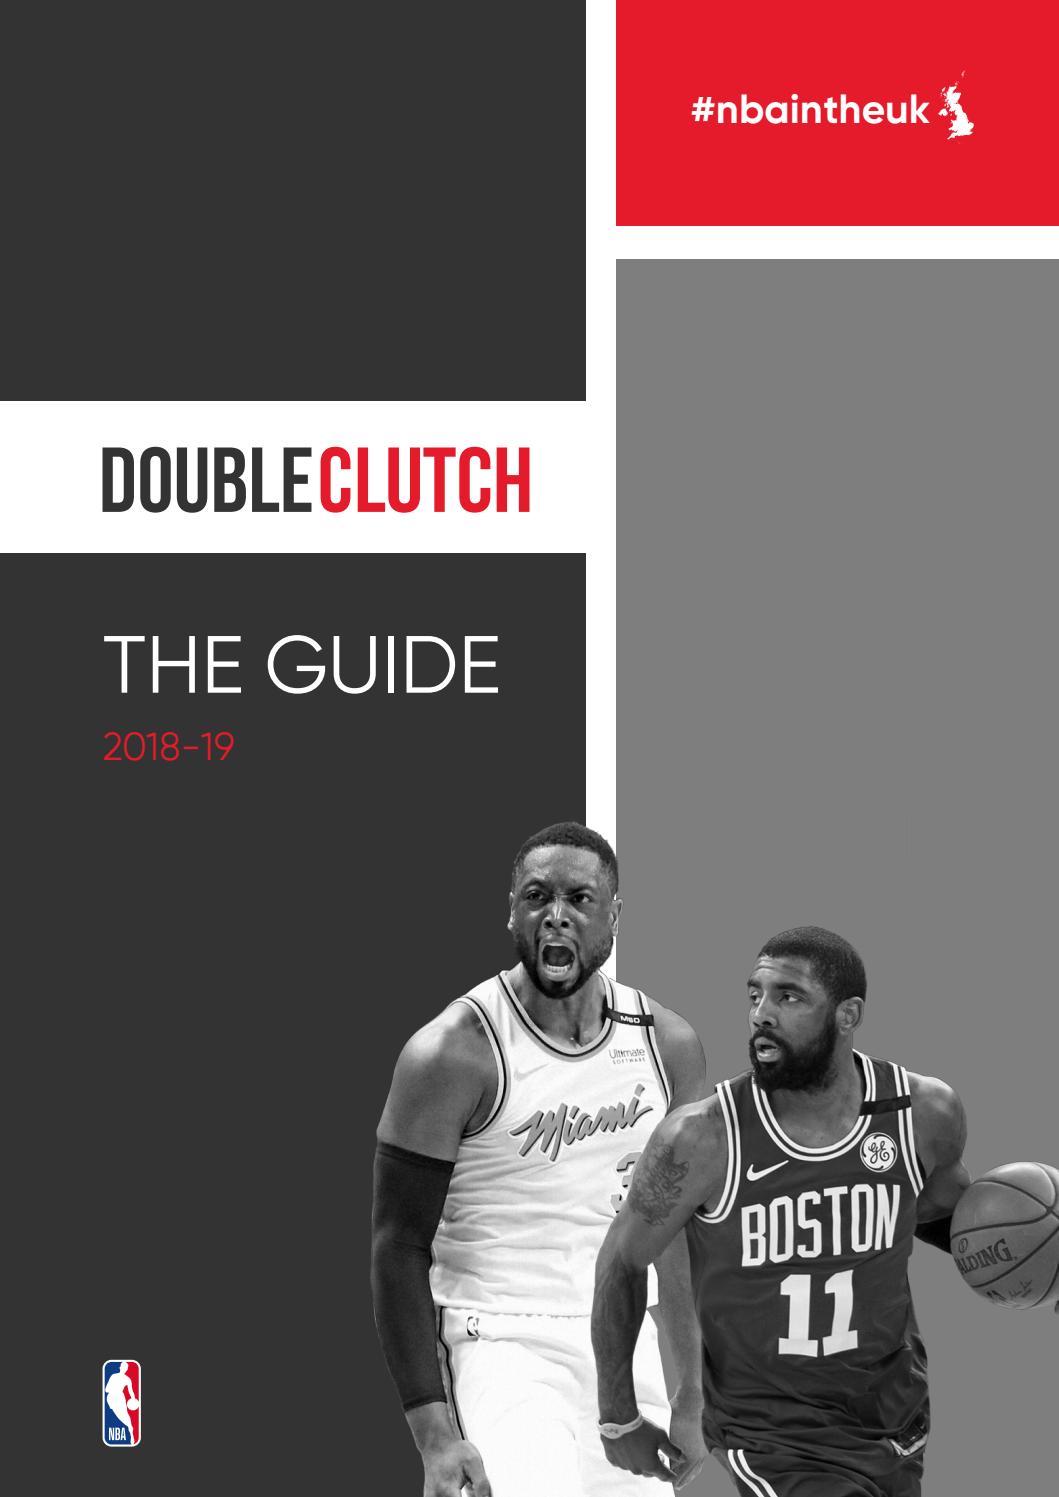 1b25a019fe1a 2018-19 NBA Season Guide - Double Clutch UK by Double Clutch UK - issuu